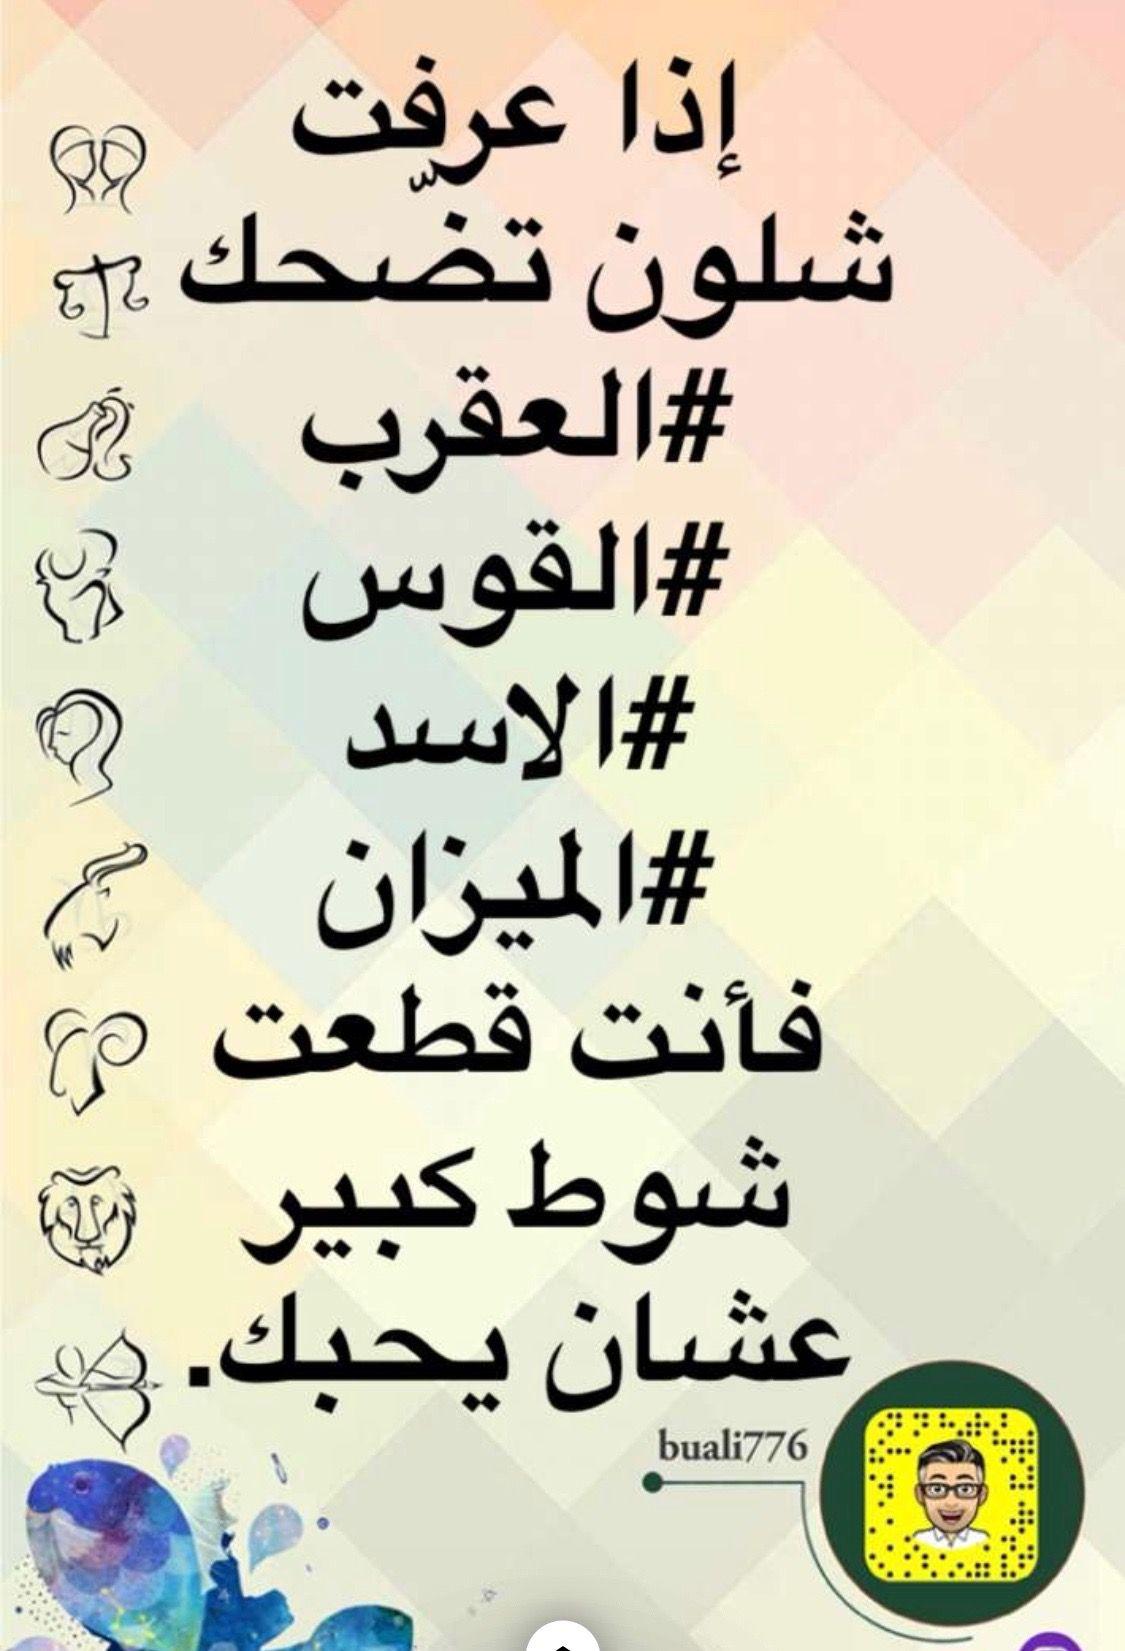 Pin By Karima Barkat On Leo Others Horoscope Emoji Wallpaper My Love